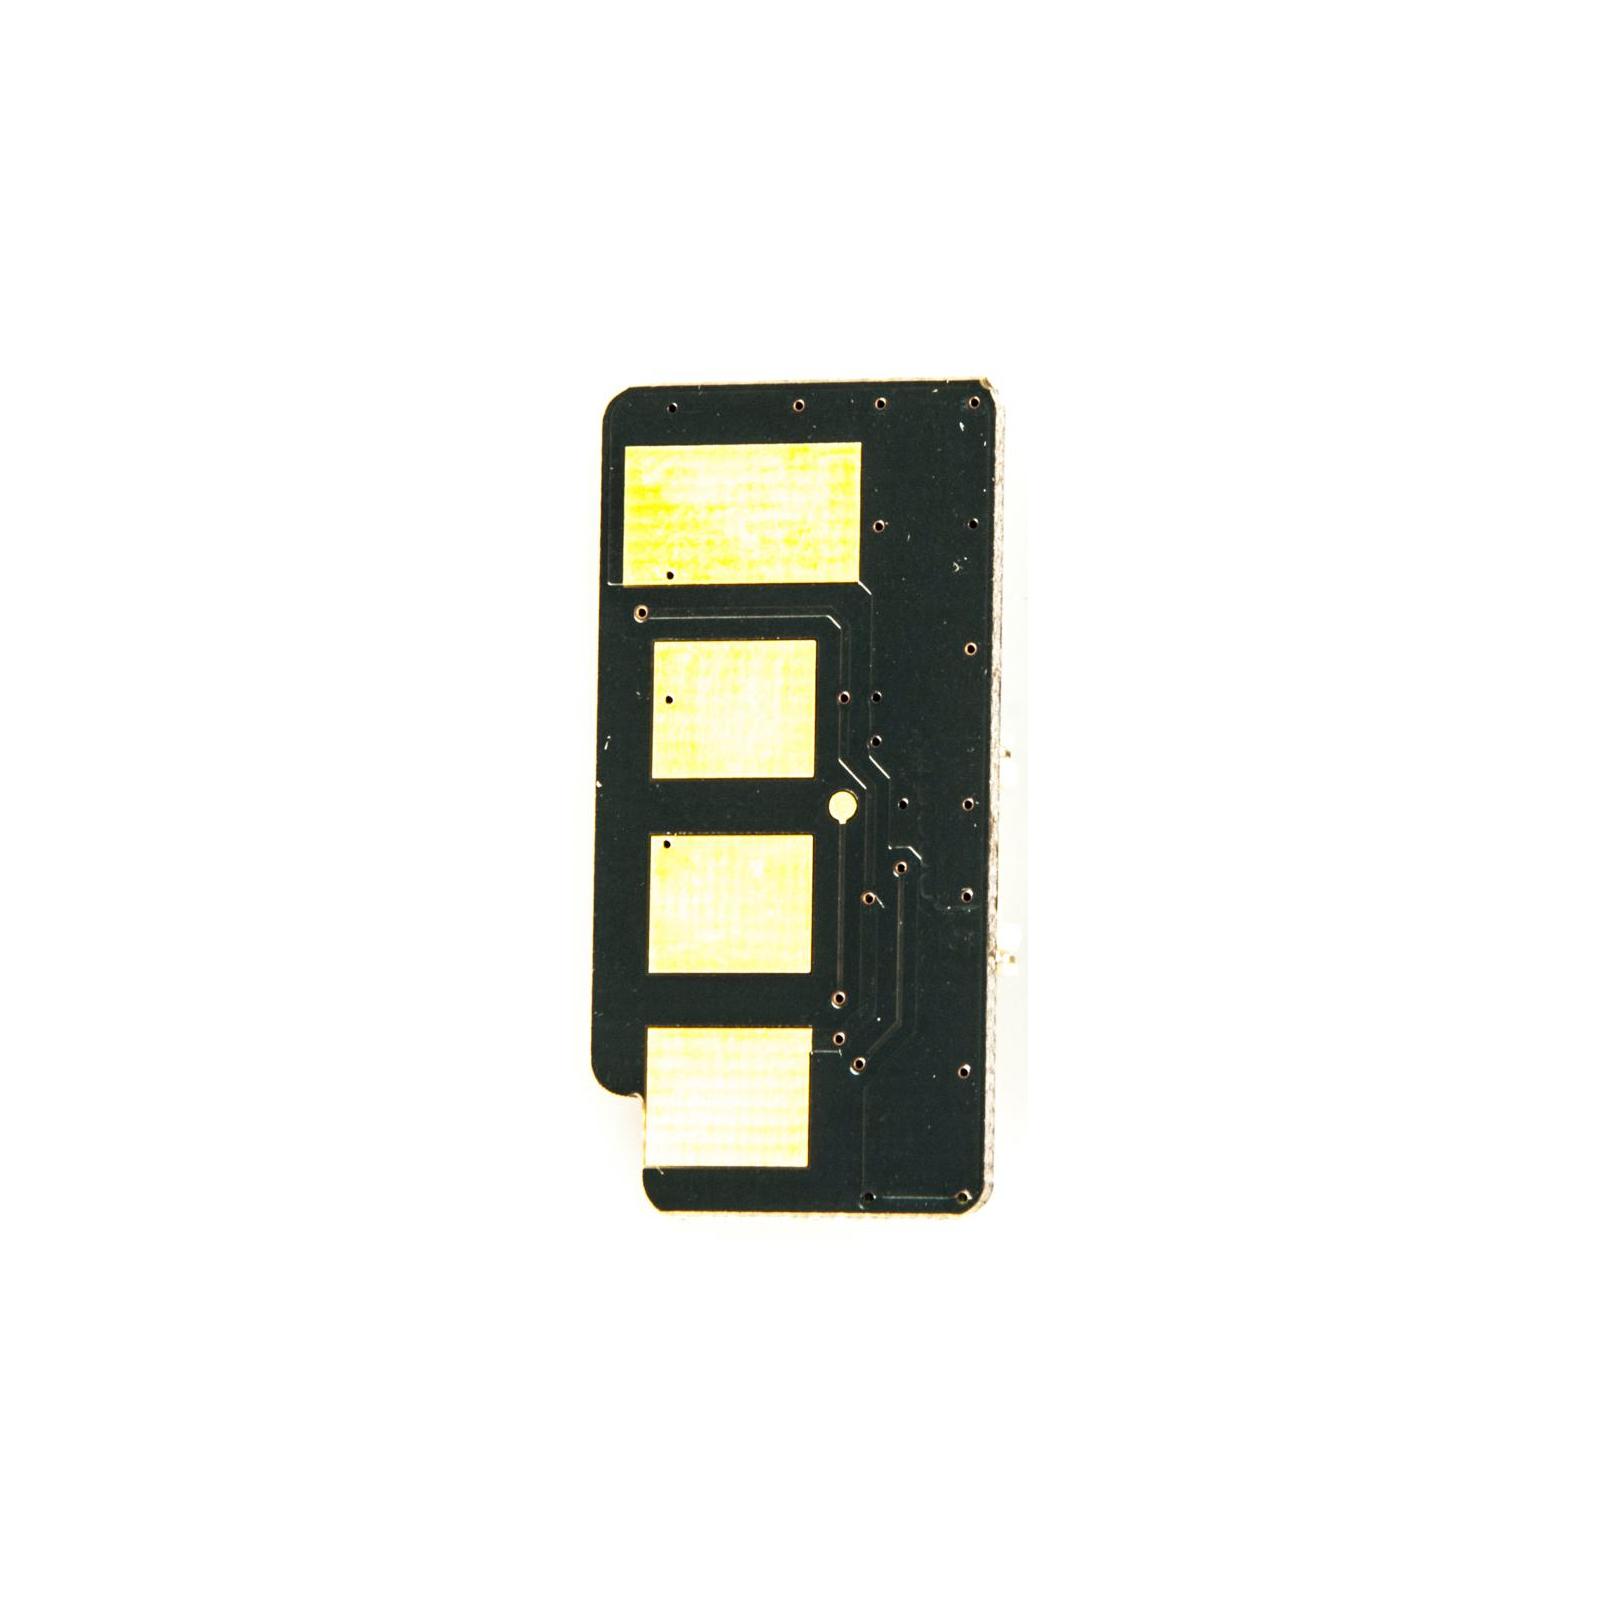 Чип для картриджа Xerox Ph 4600/4620 80K EVERPRINT (CHIP-XER-4600-DR) изображение 2